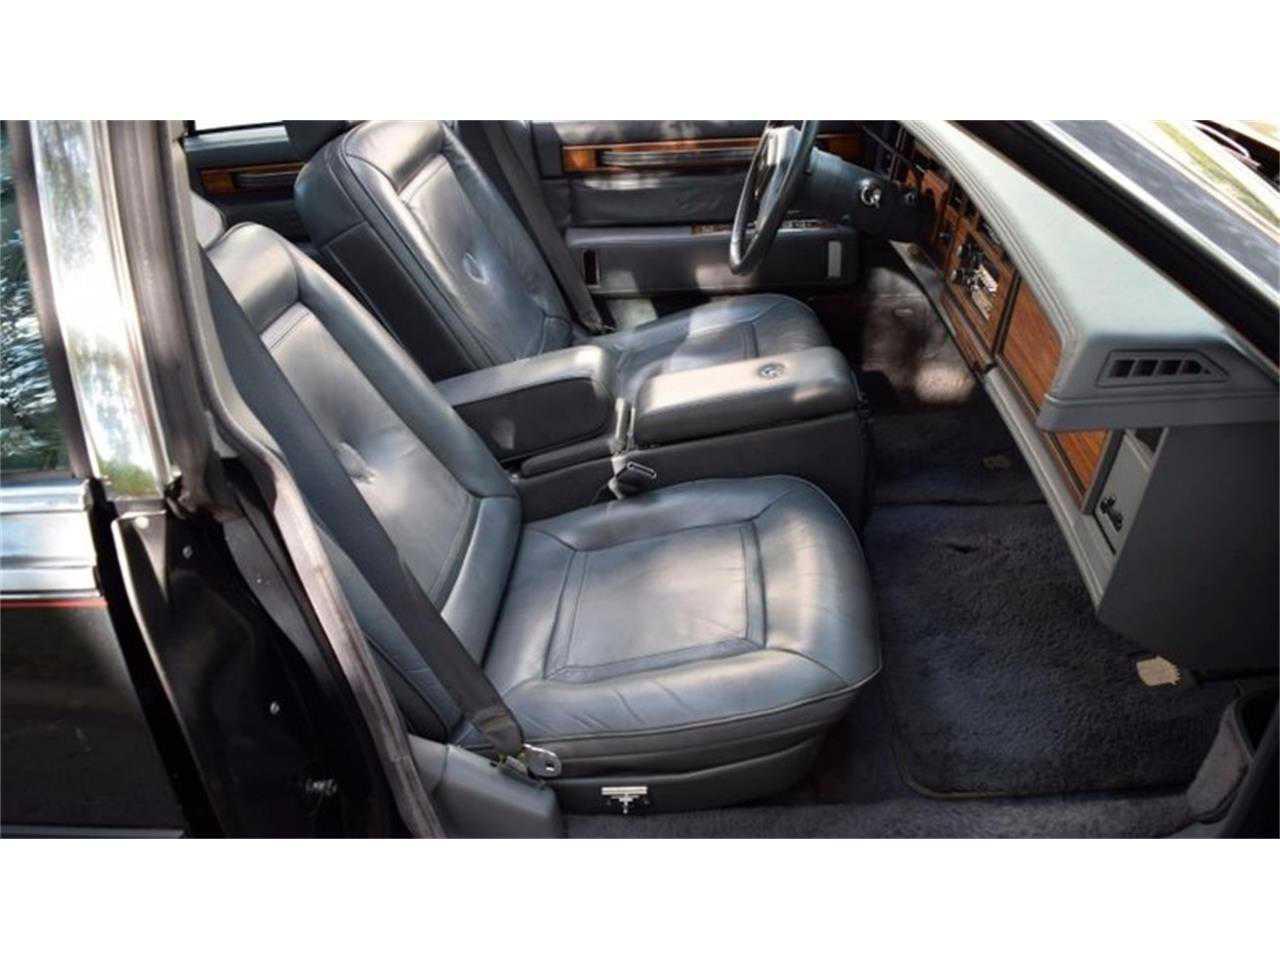 1985 Cadillac Seville Elegante For Sale In 1g6ks6983fe807190